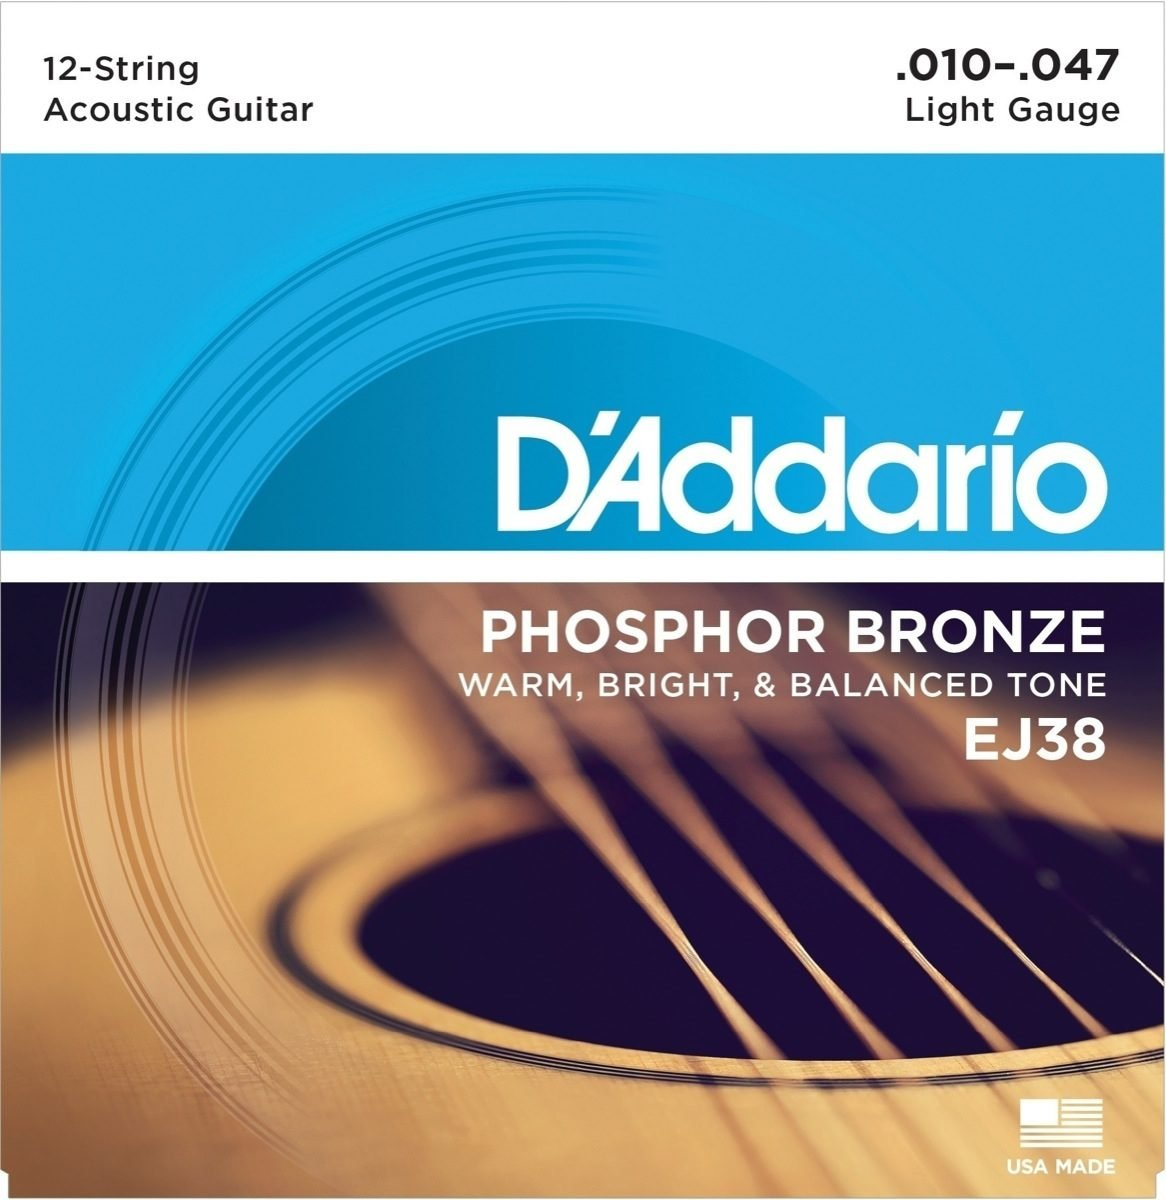 D'Addario PB 12-string 10-47